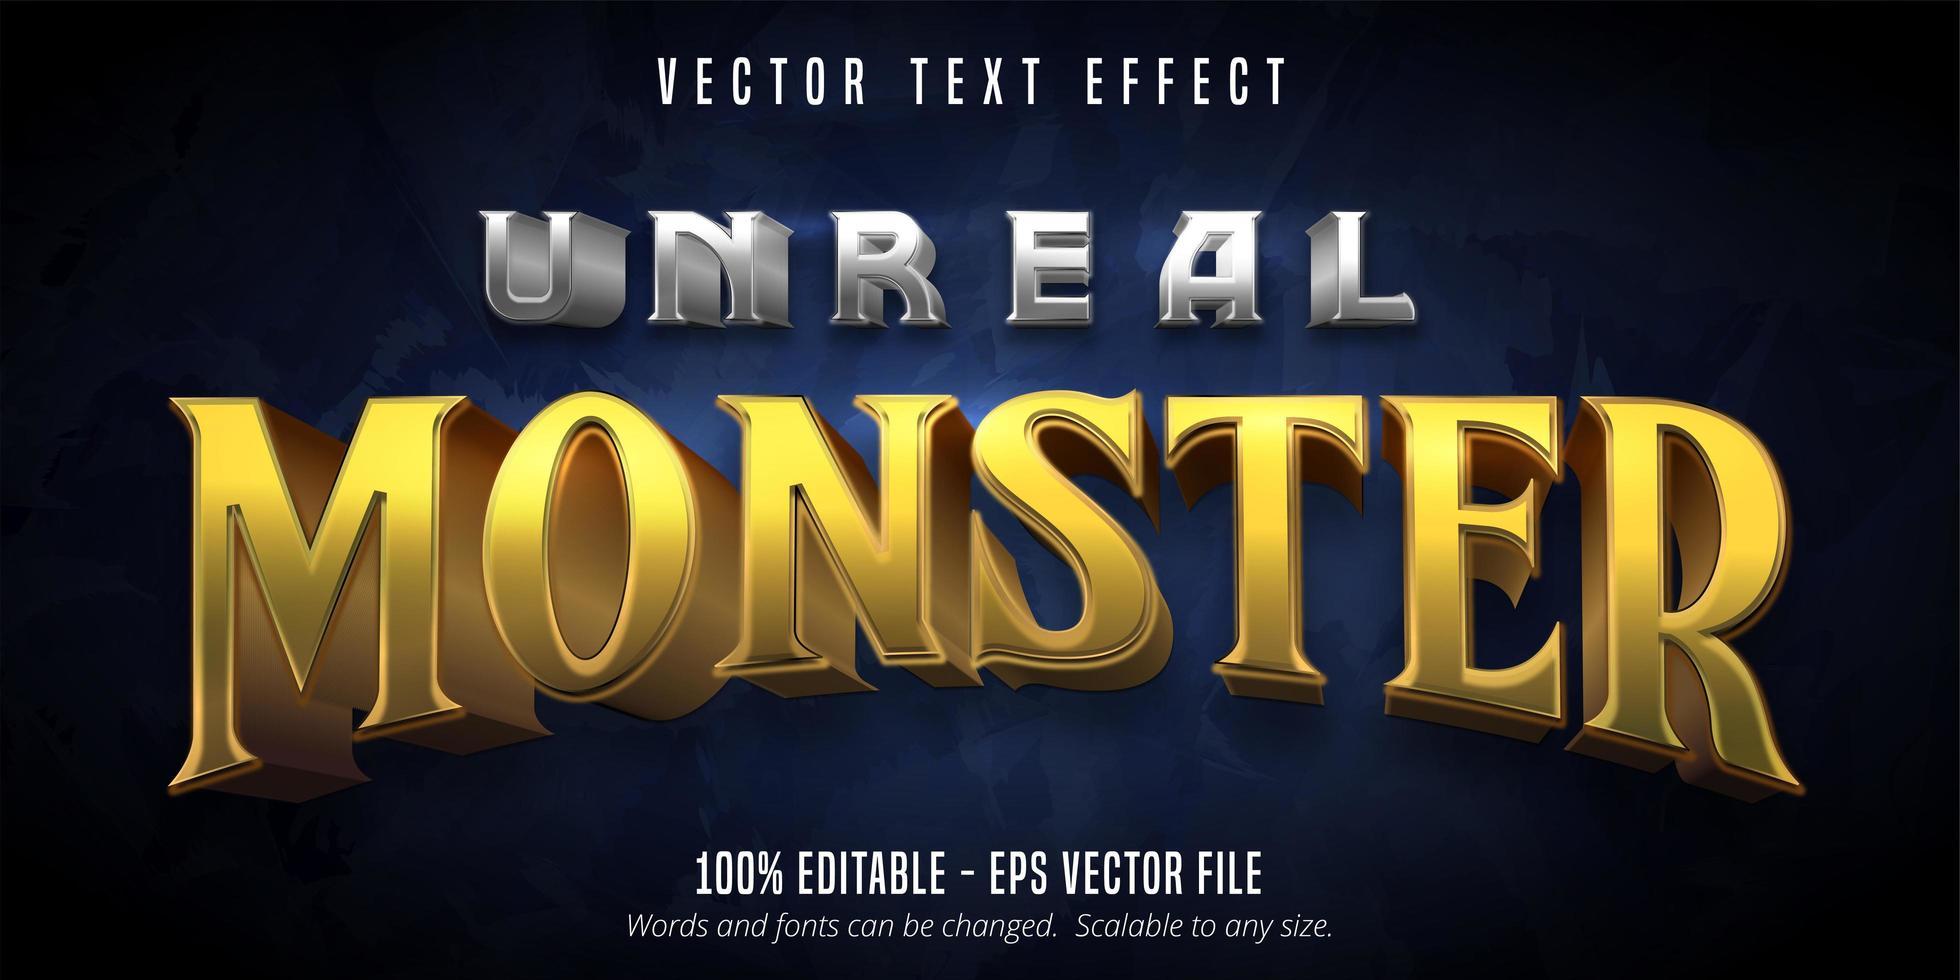 efeito de texto de estilo de jogo metálico monstro irreal vetor